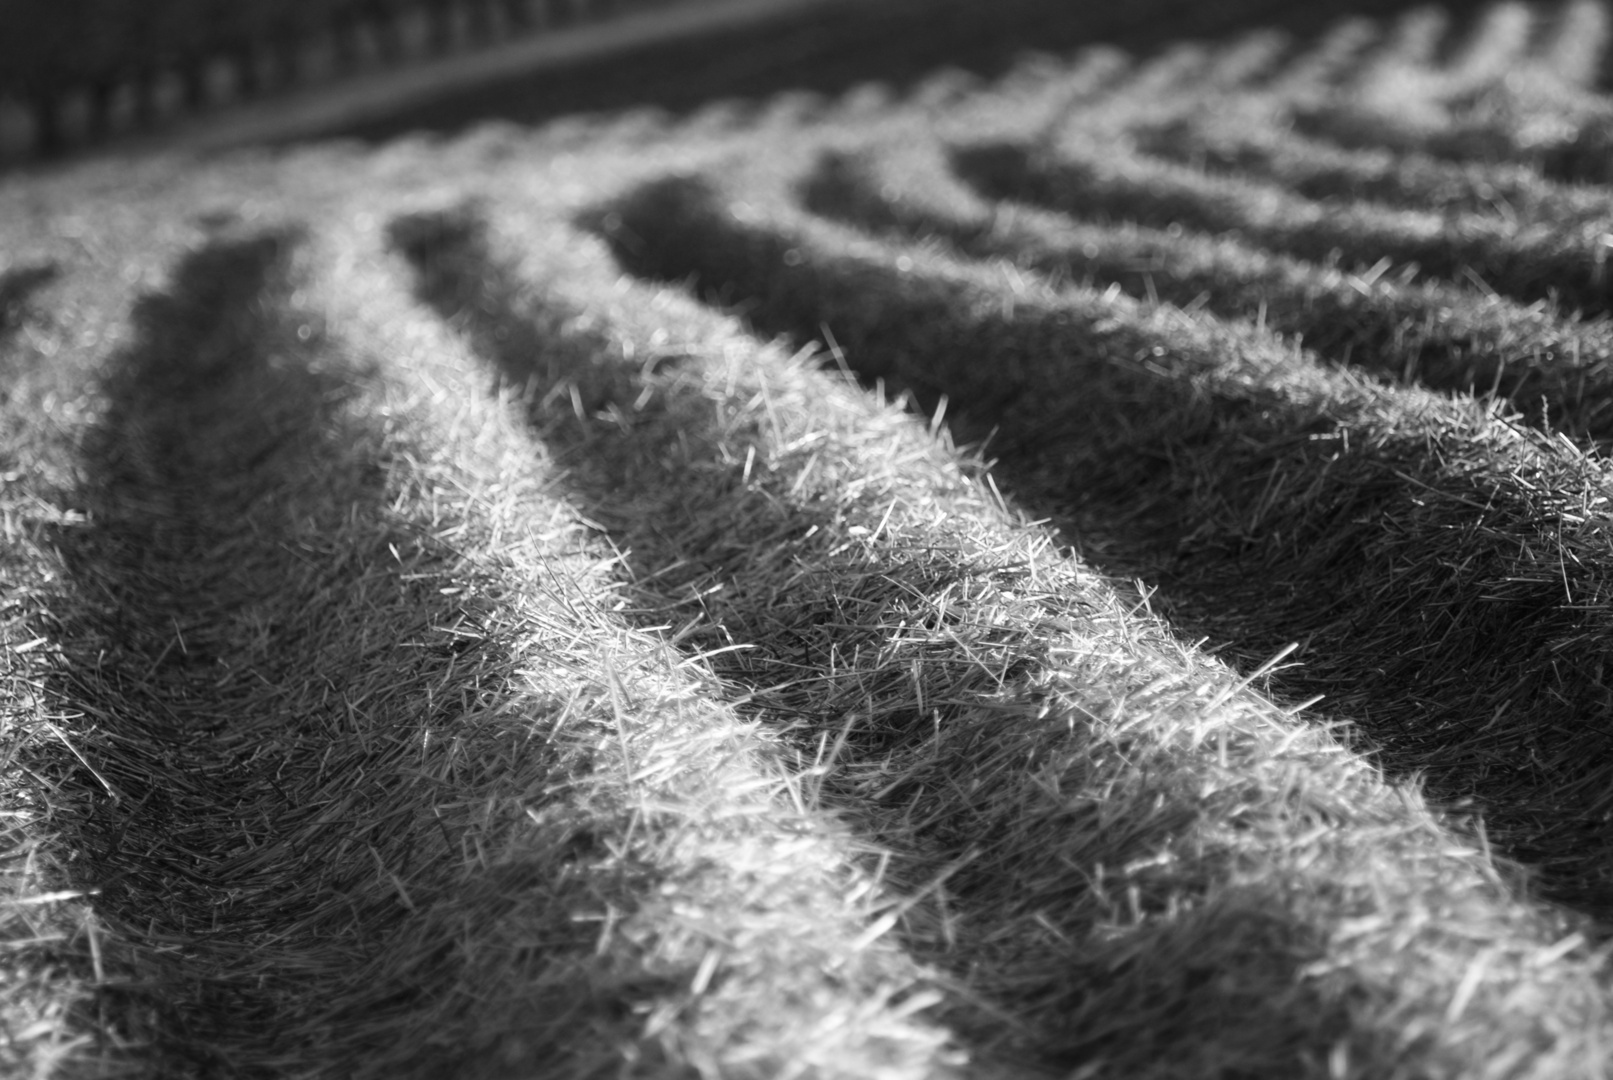 Erdbeerfeld im Winter